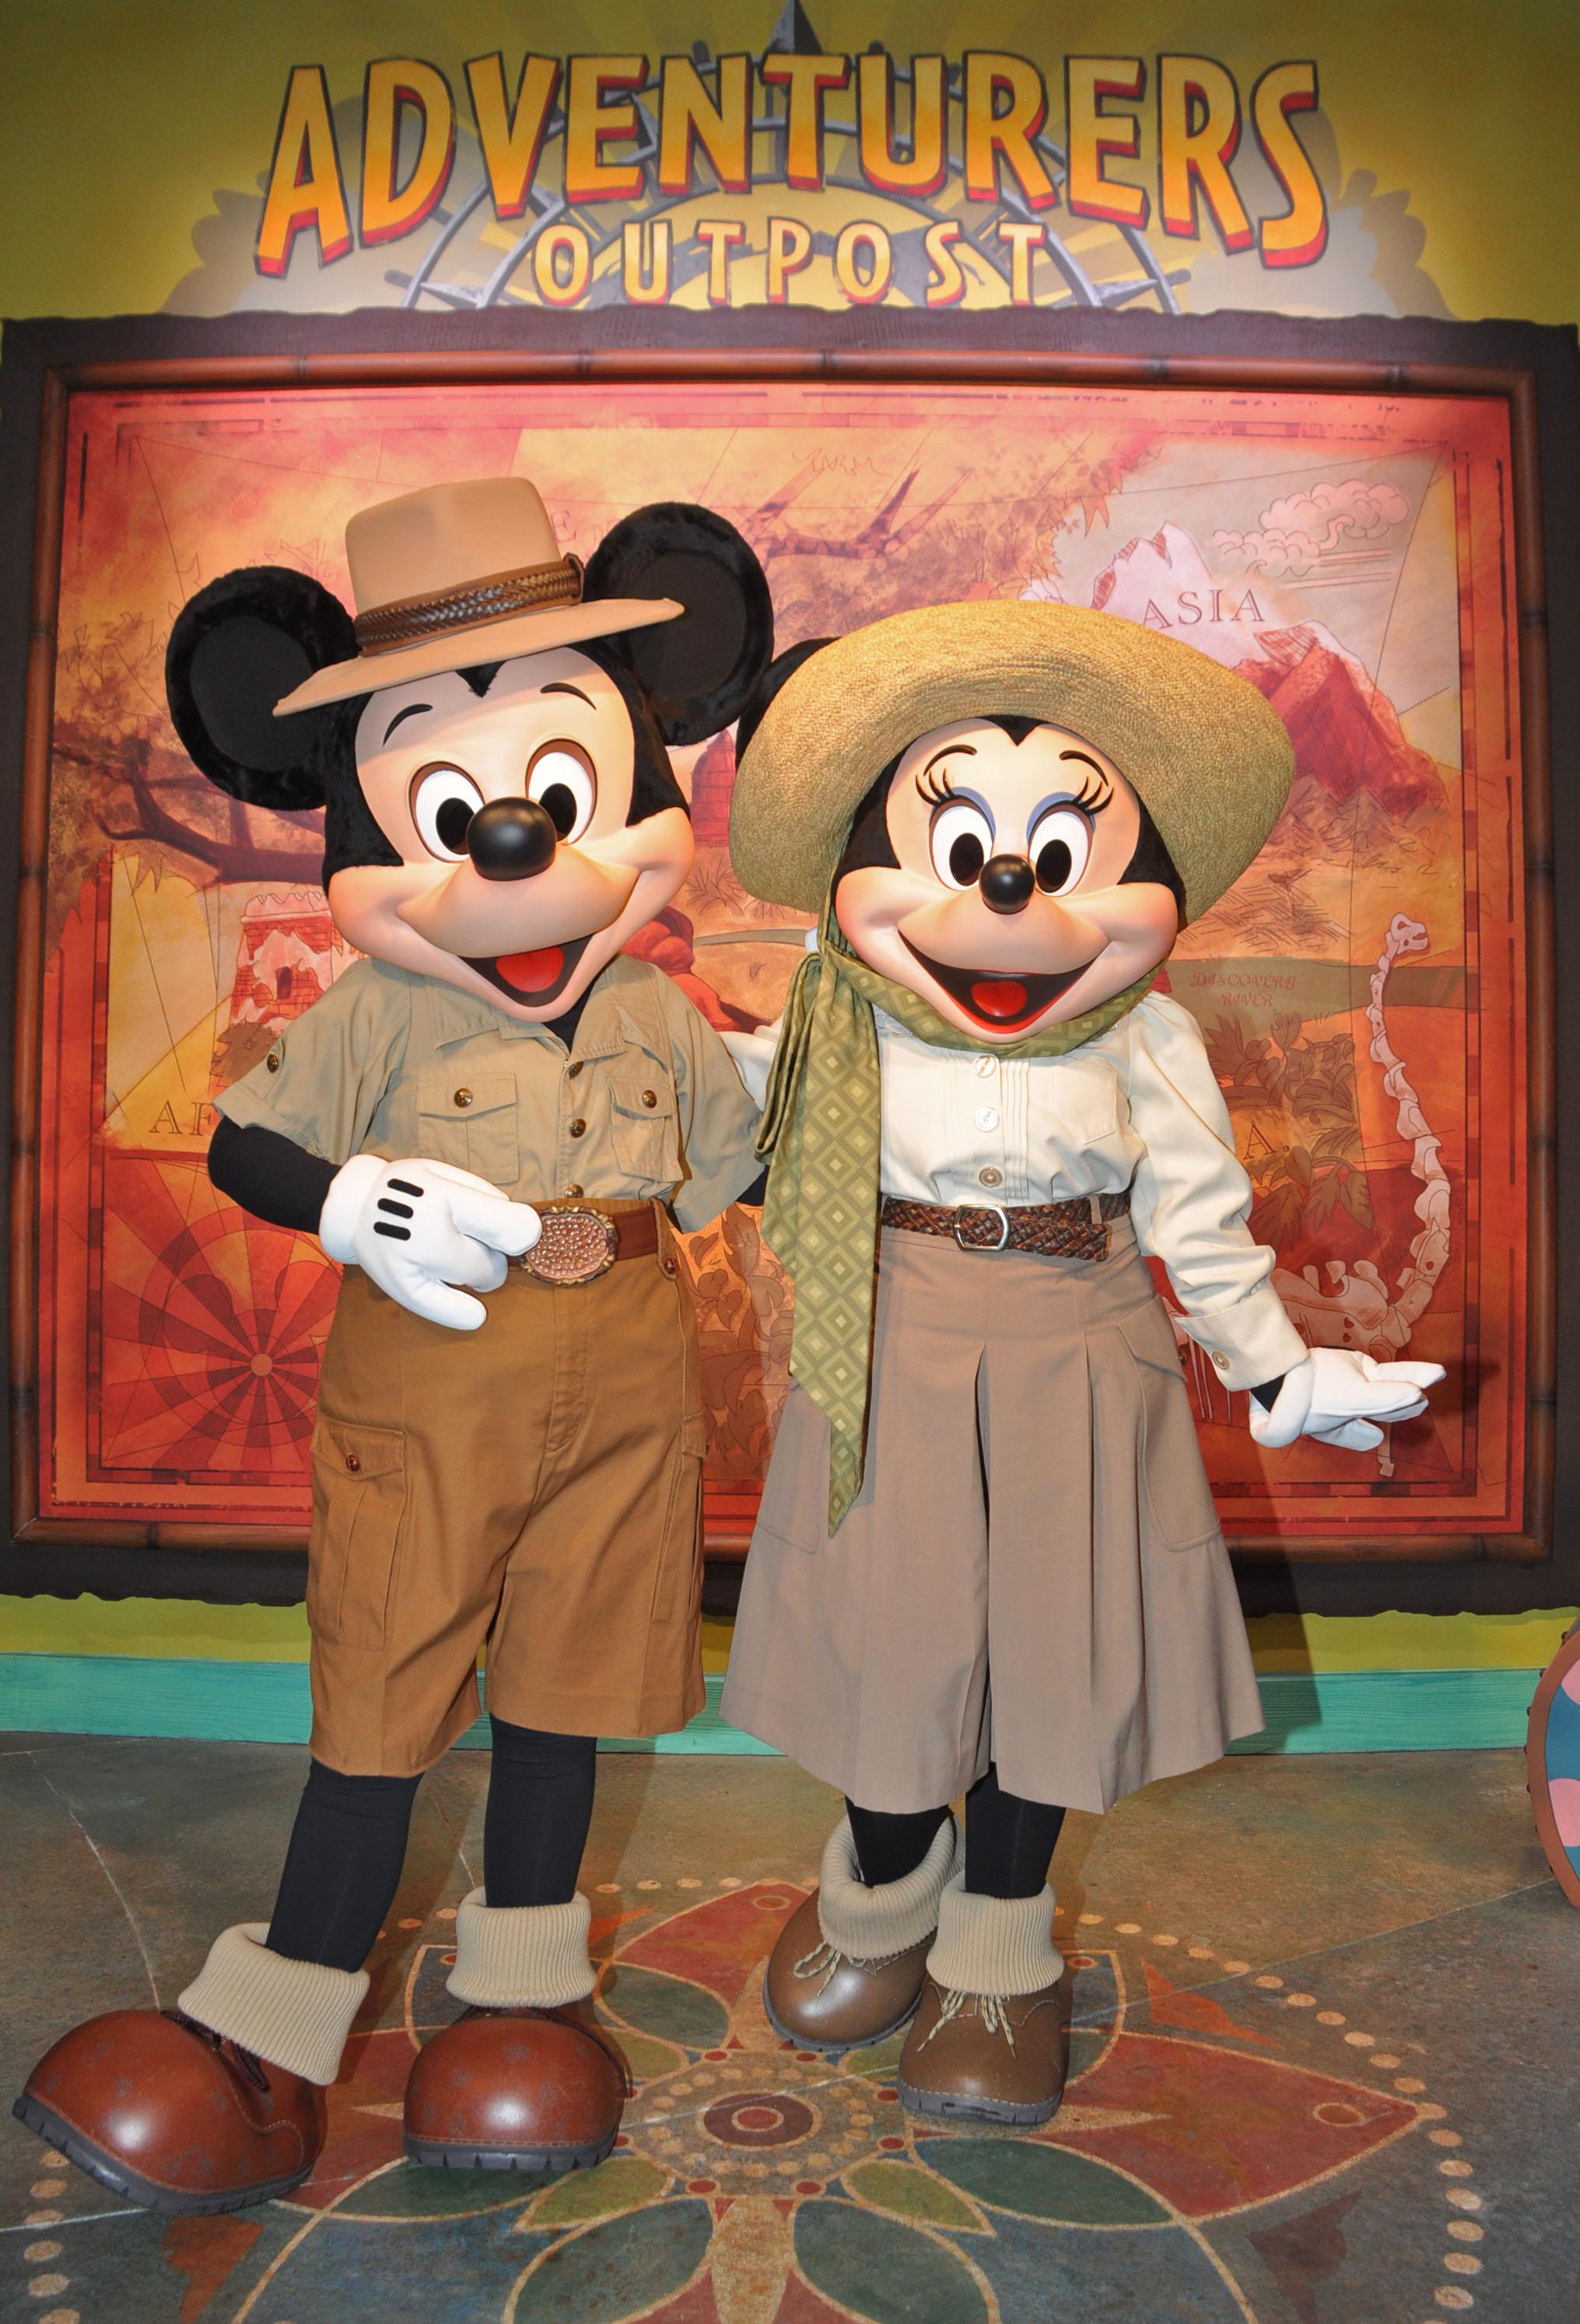 Meet Mickey and Minnie